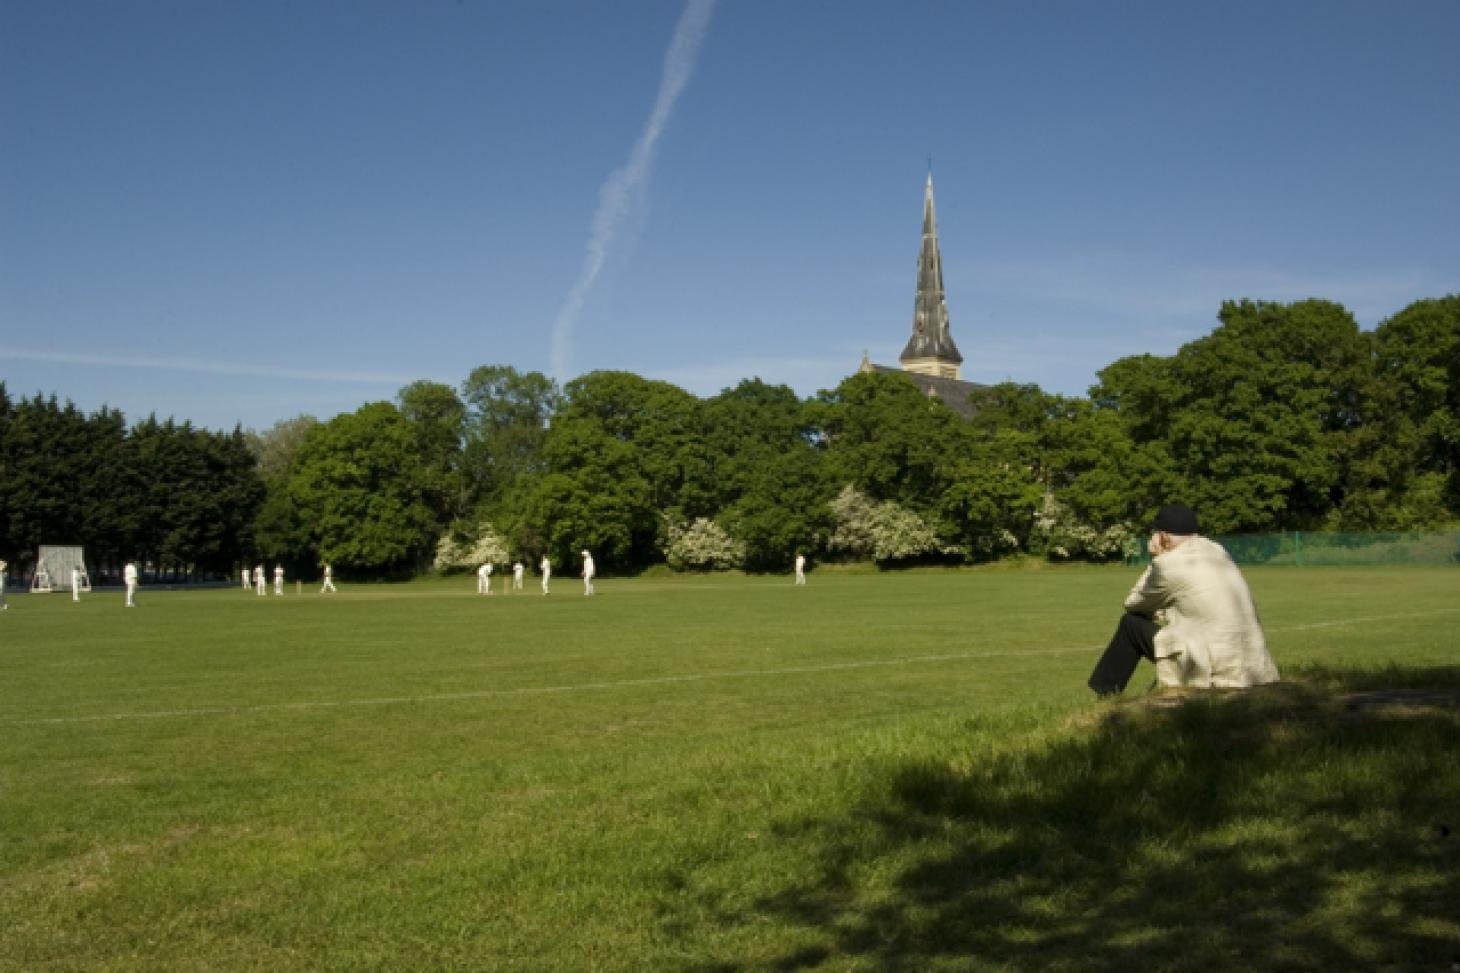 Streatham & Marlborough Cricket Club Full size | Grass cricket facilities